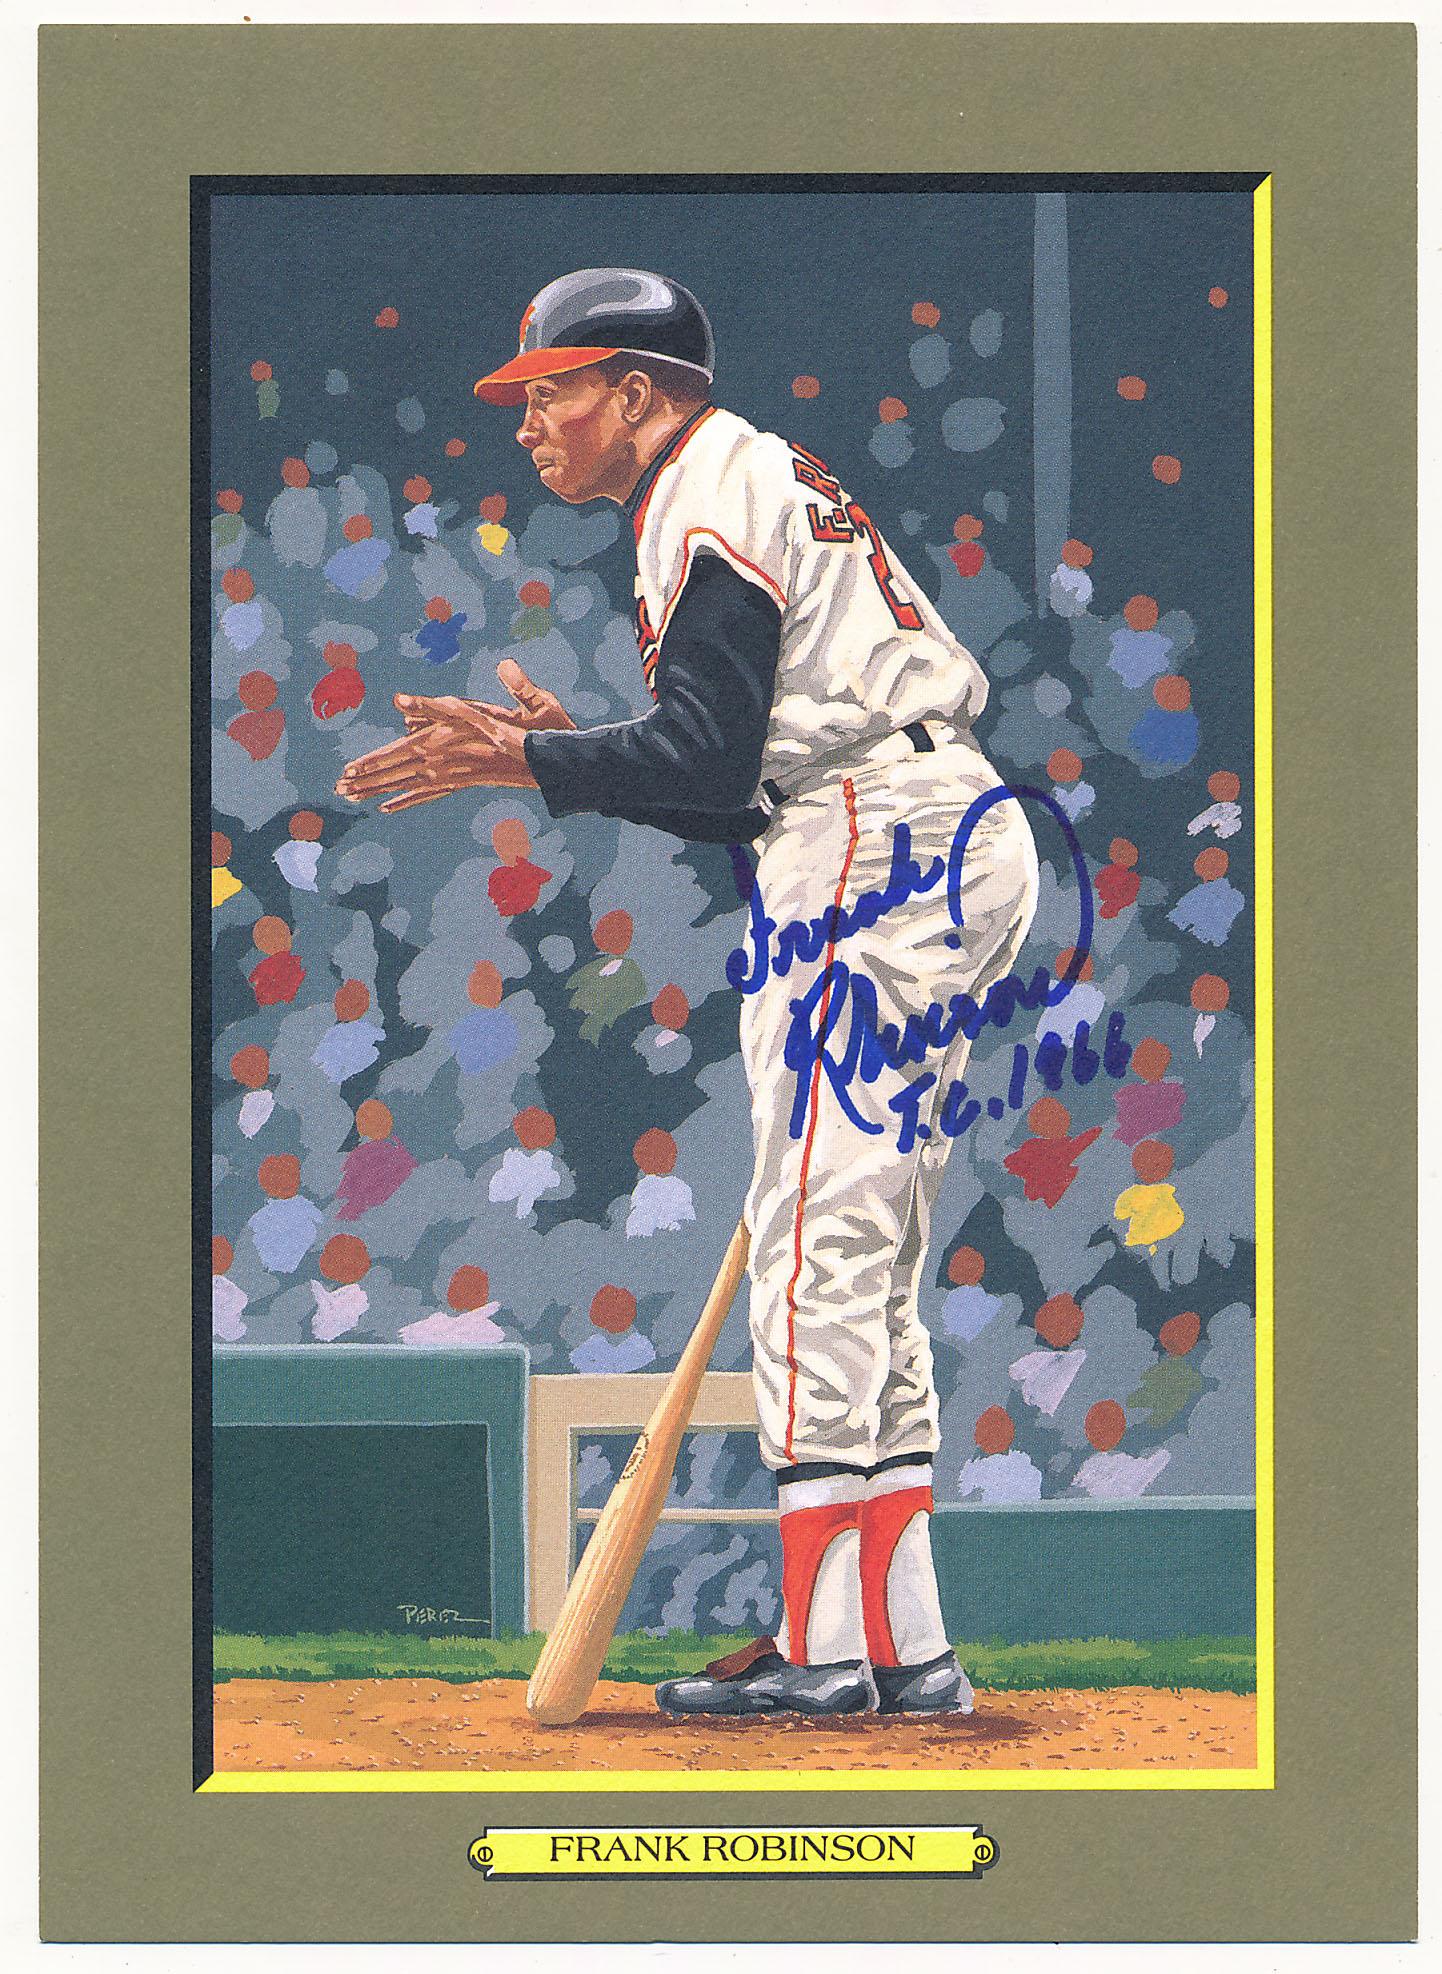 Lot #150 1985 Perez Steele Greatest Moments # 94 Frank Robinson (JSA LOAA) Cond: 9.5 (TC 1966)